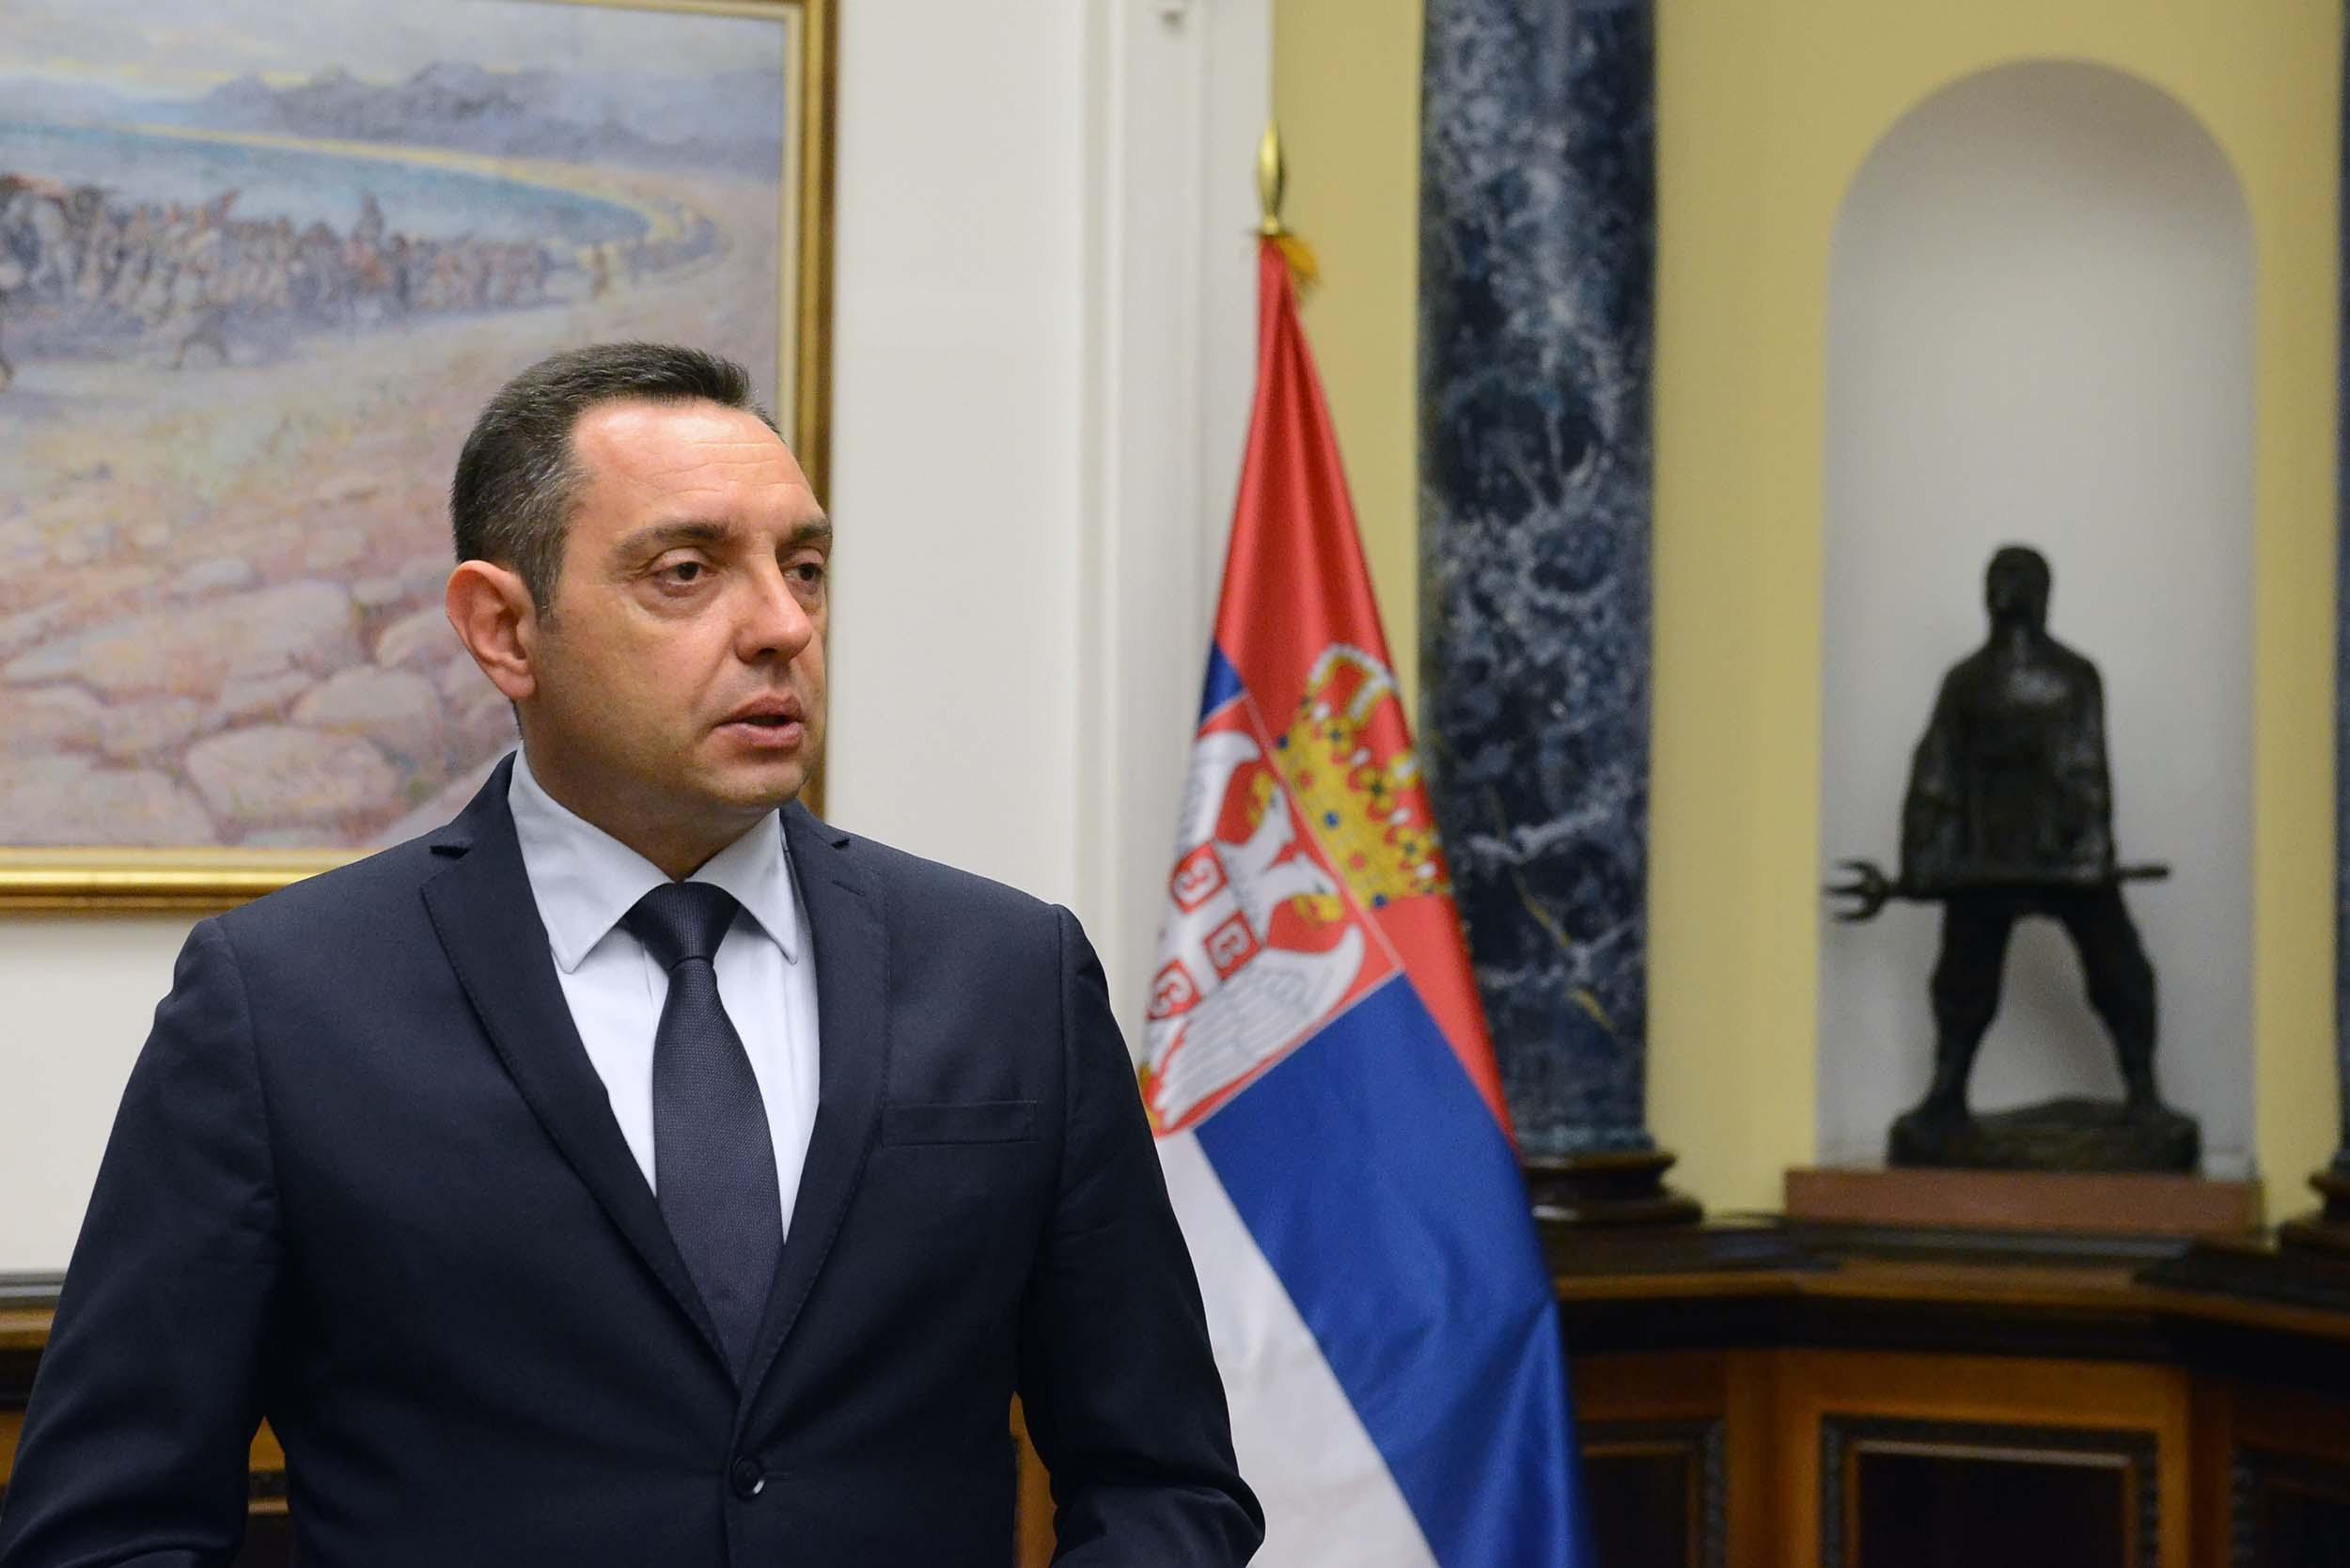 Ministar Vulin: Sve je spremno za prikaz sposobnosti VS